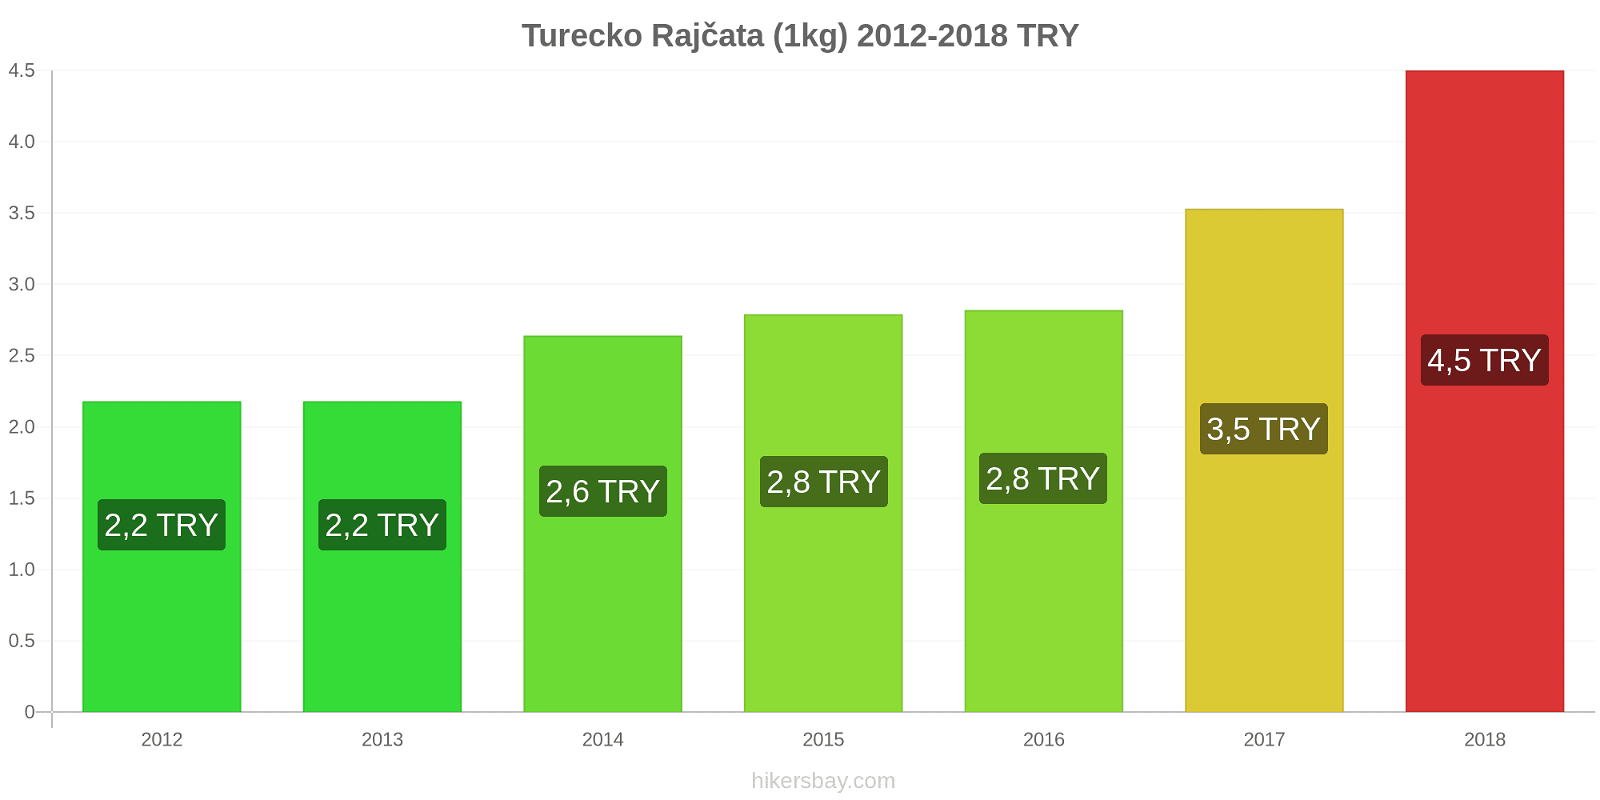 Turecko změny cen Rajčata (1kg) hikersbay.com